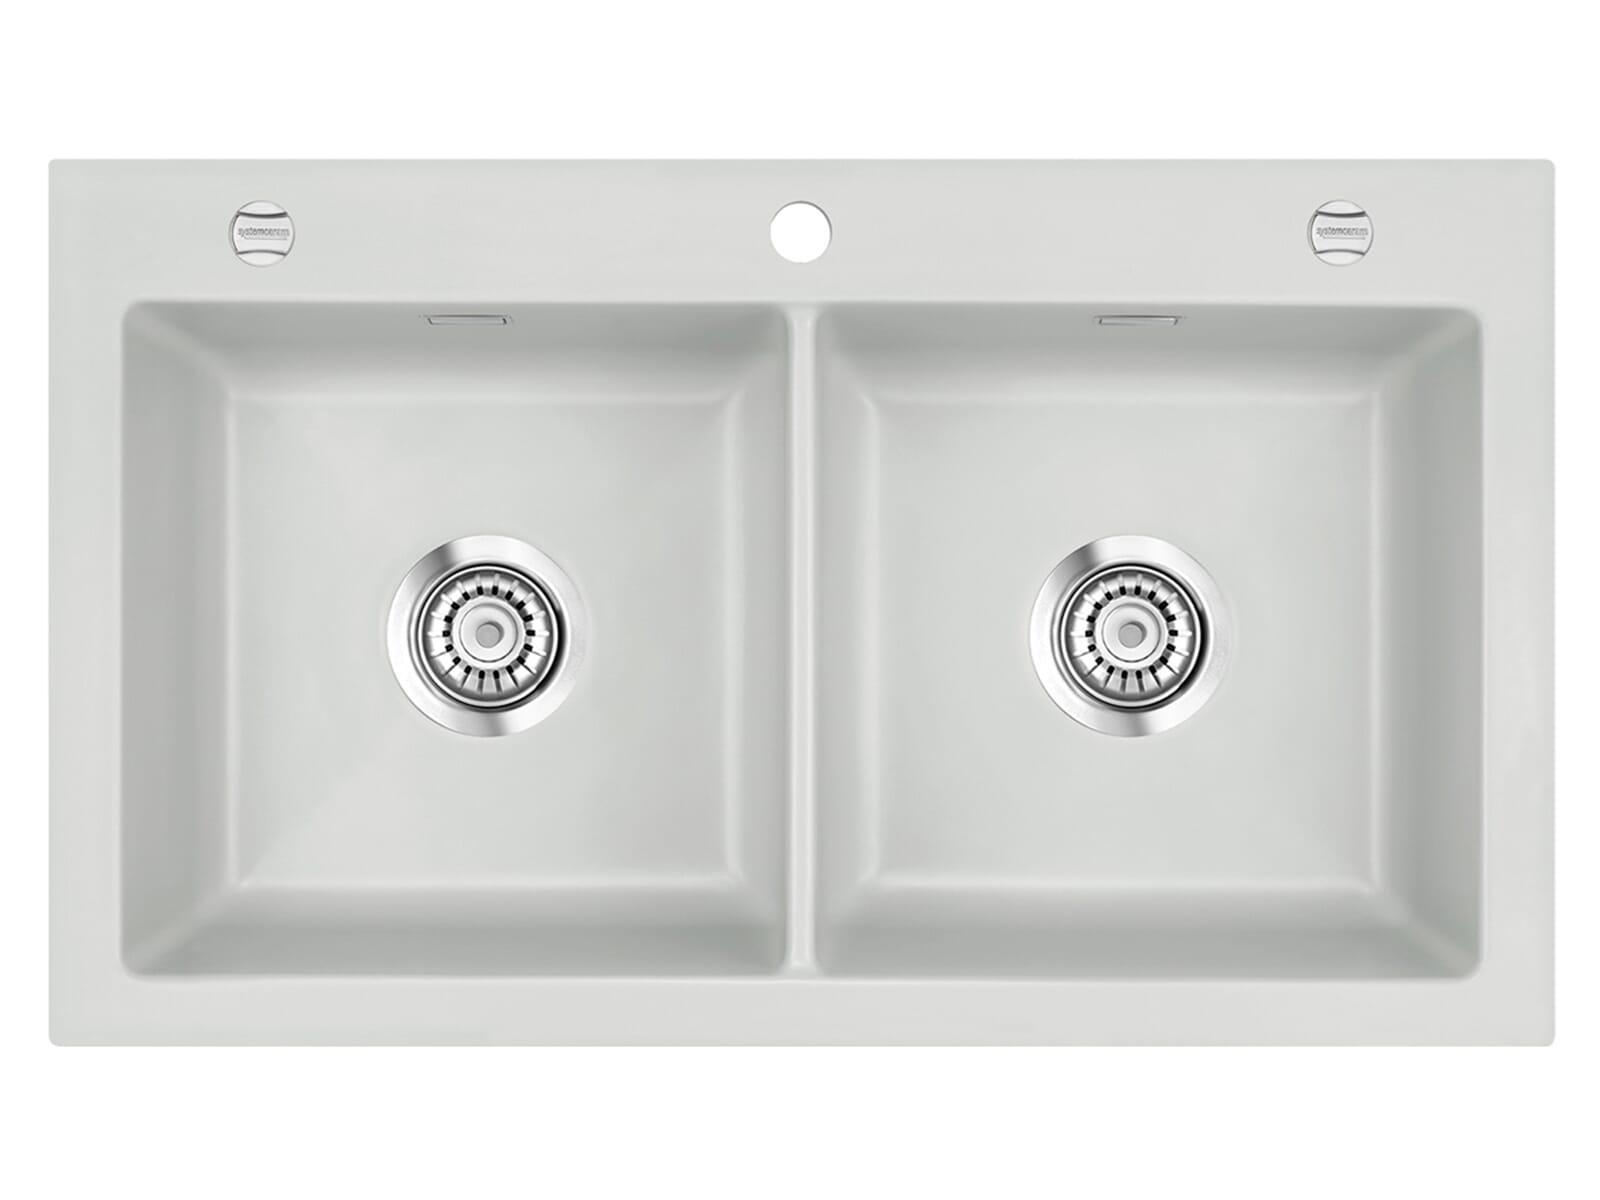 Systemceram Mera Twin Alu Keramikspüle Excenterbetätigung